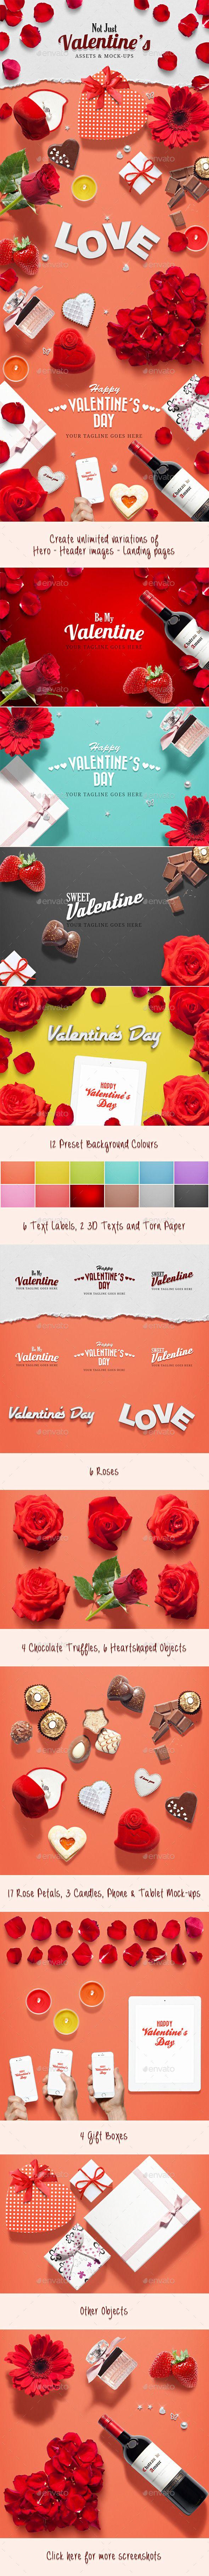 Love / Valentine's Day Scene Creator | Buy and Download: http://graphicriver.net/item/love-valentines-day-scene-creator/10034553?ref=ksioks